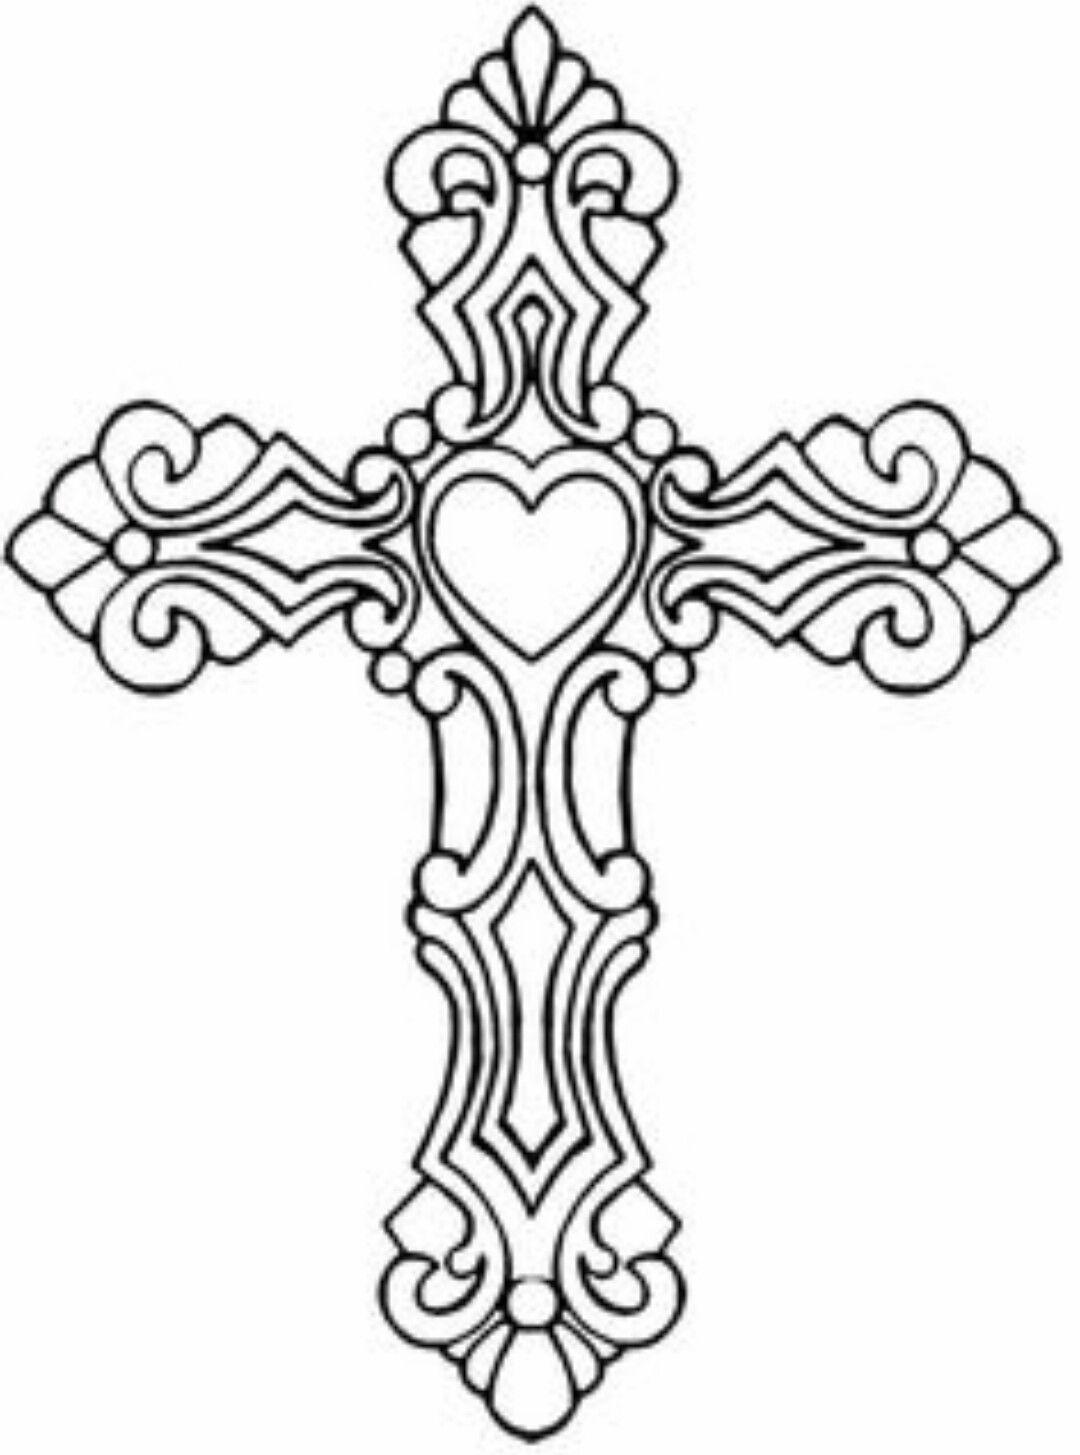 Pin By Kevin Scott On Mom S Birthday Cross Cross Coloring Page Coloring Pages Cross Drawing